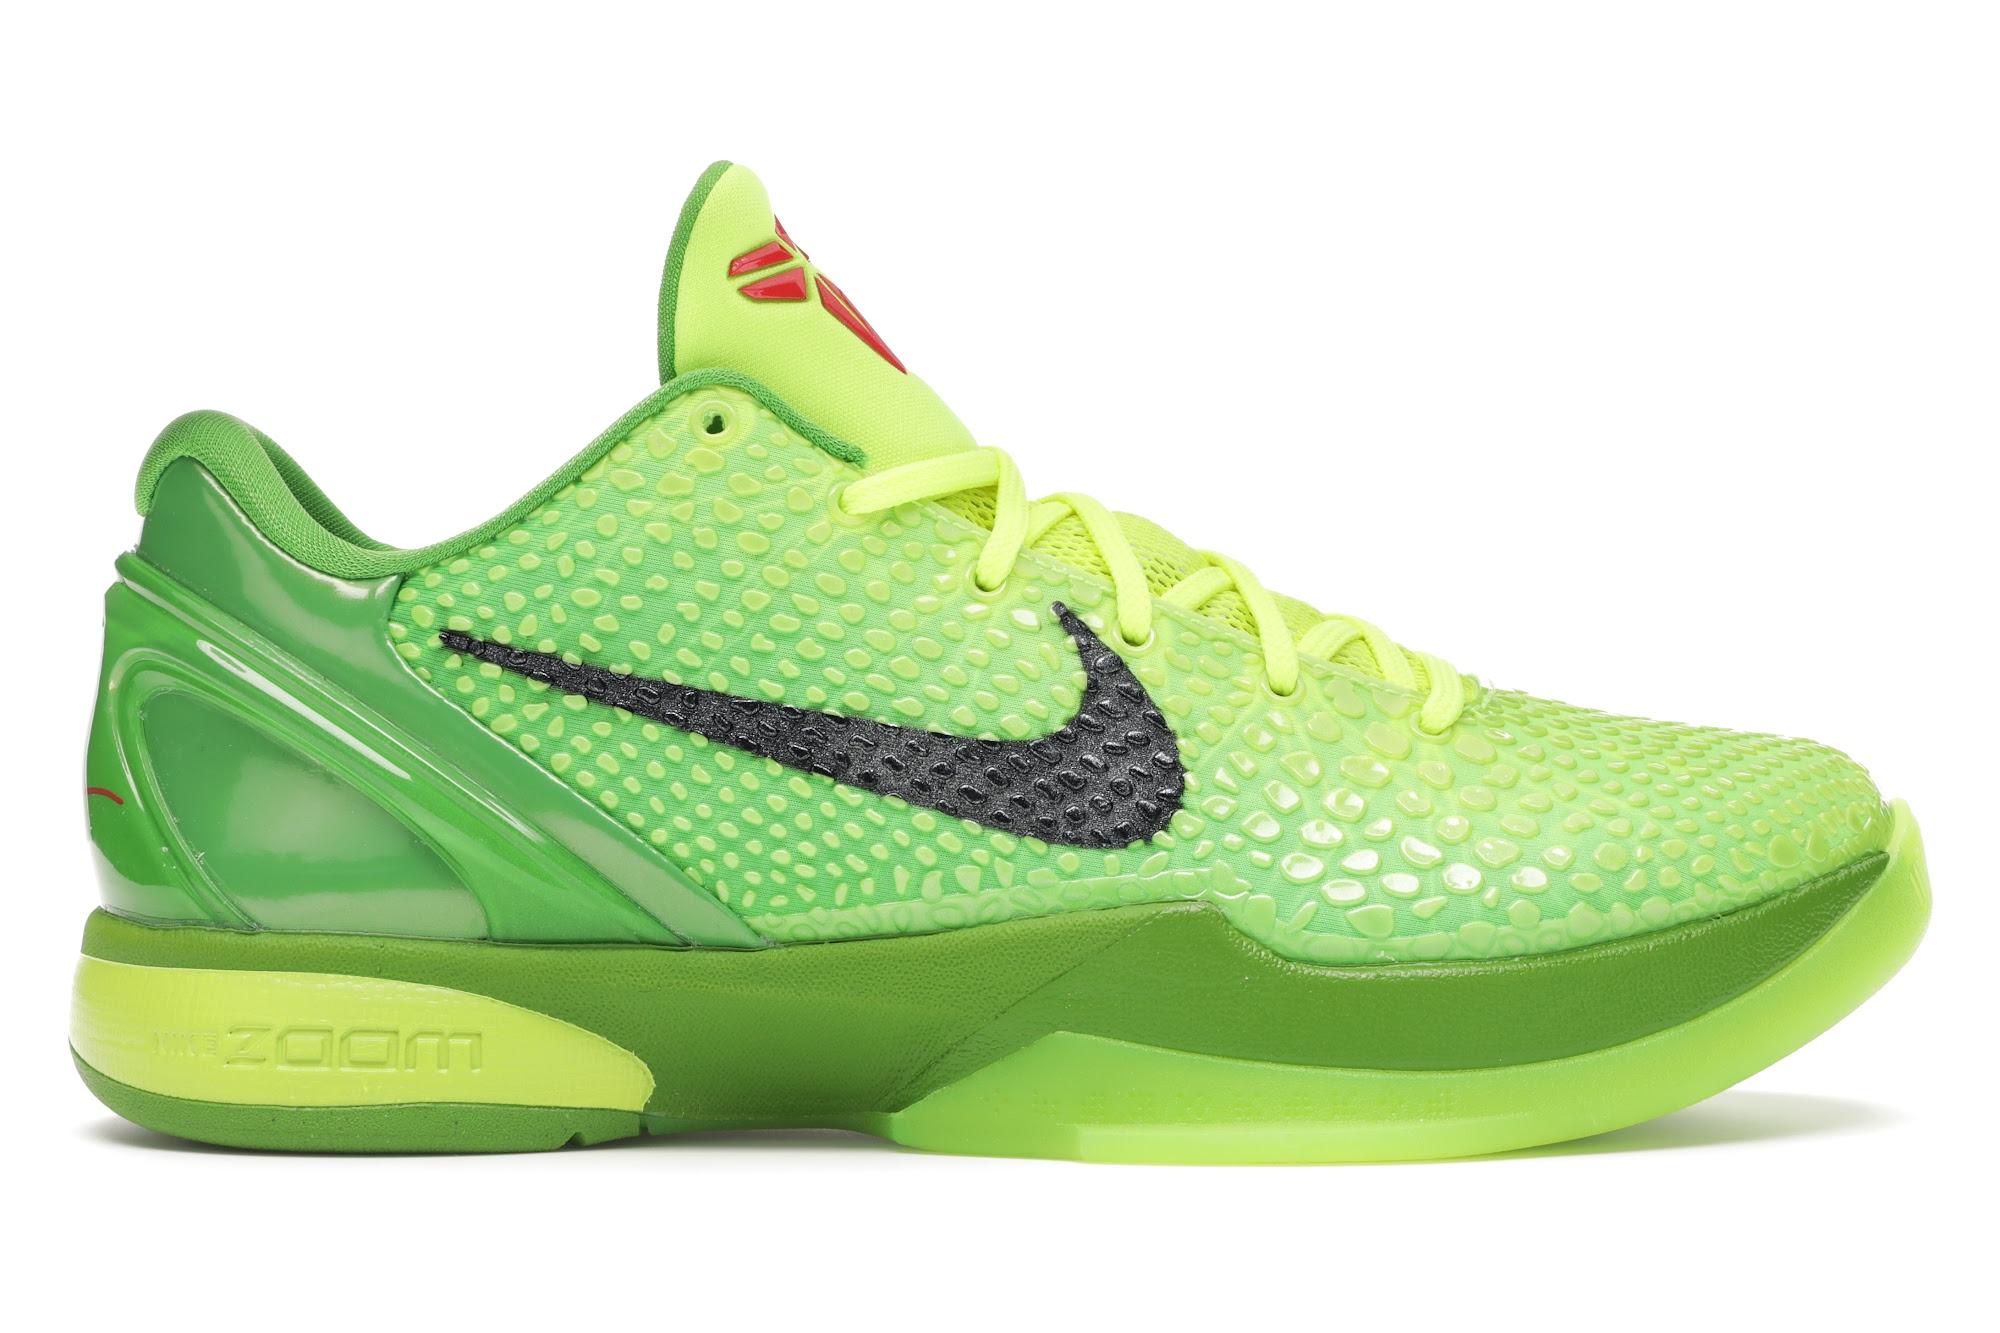 Nike Kobe 6 Protro Grinch (2020)